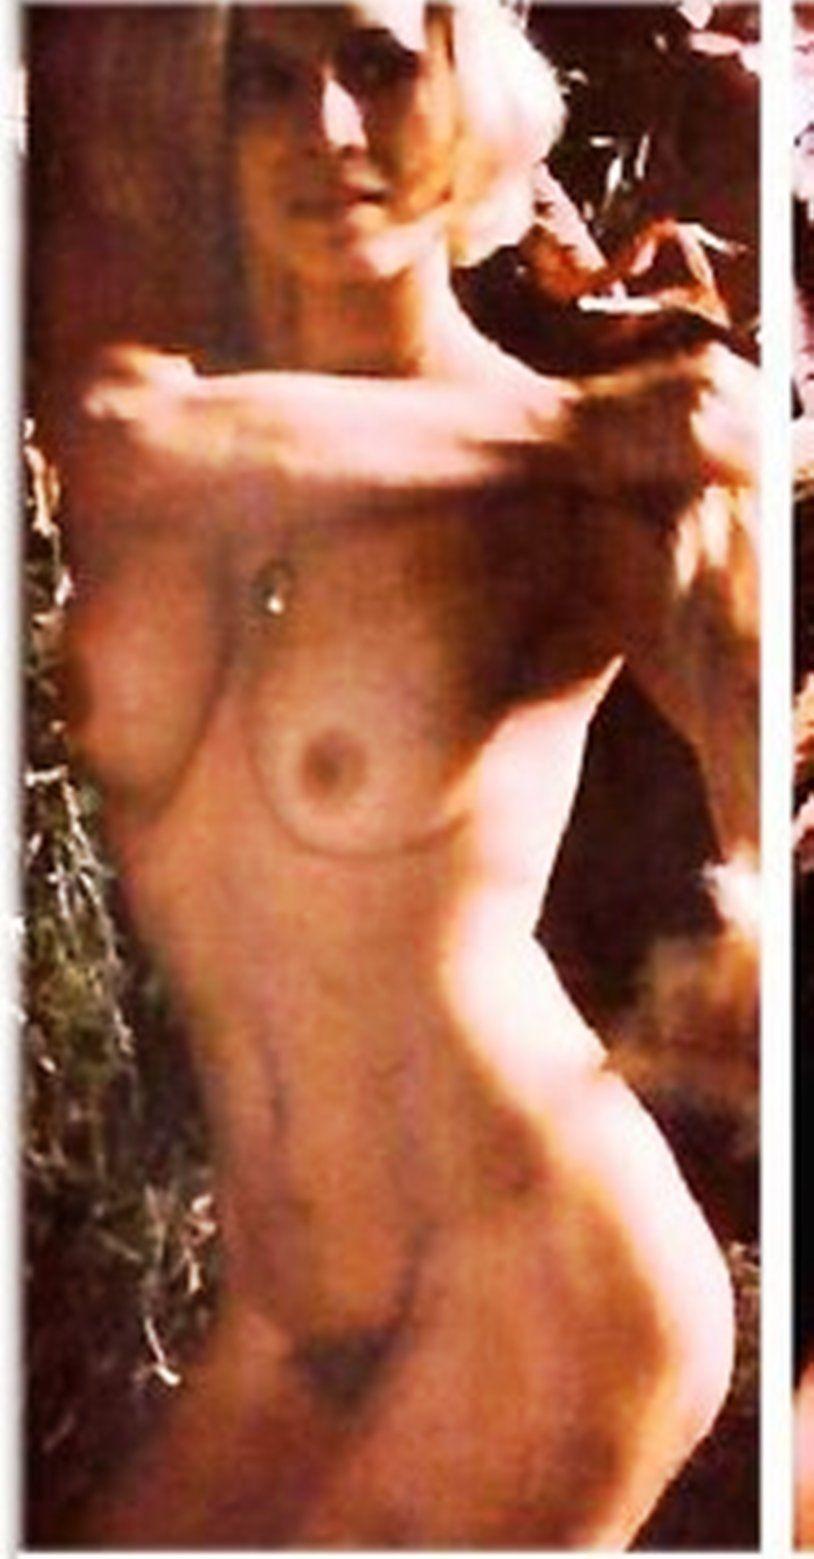 women-arlene-dickinson-nude-pussy